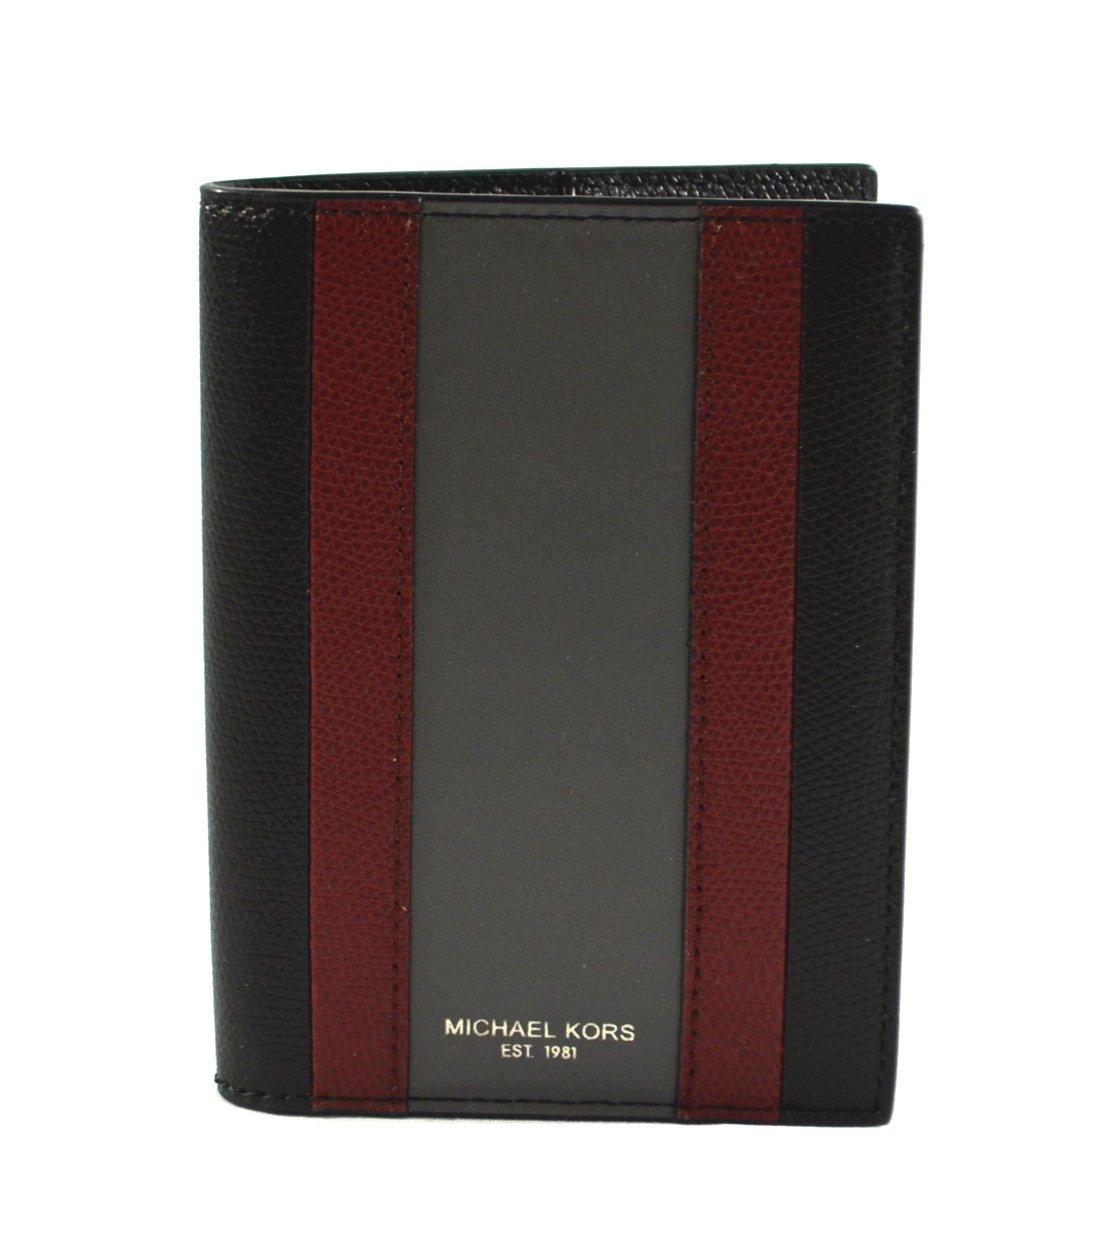 Michael Kors Warren Saffiano Leather Passport Card Holder Case Cover Wallet, Black (Black/Red)